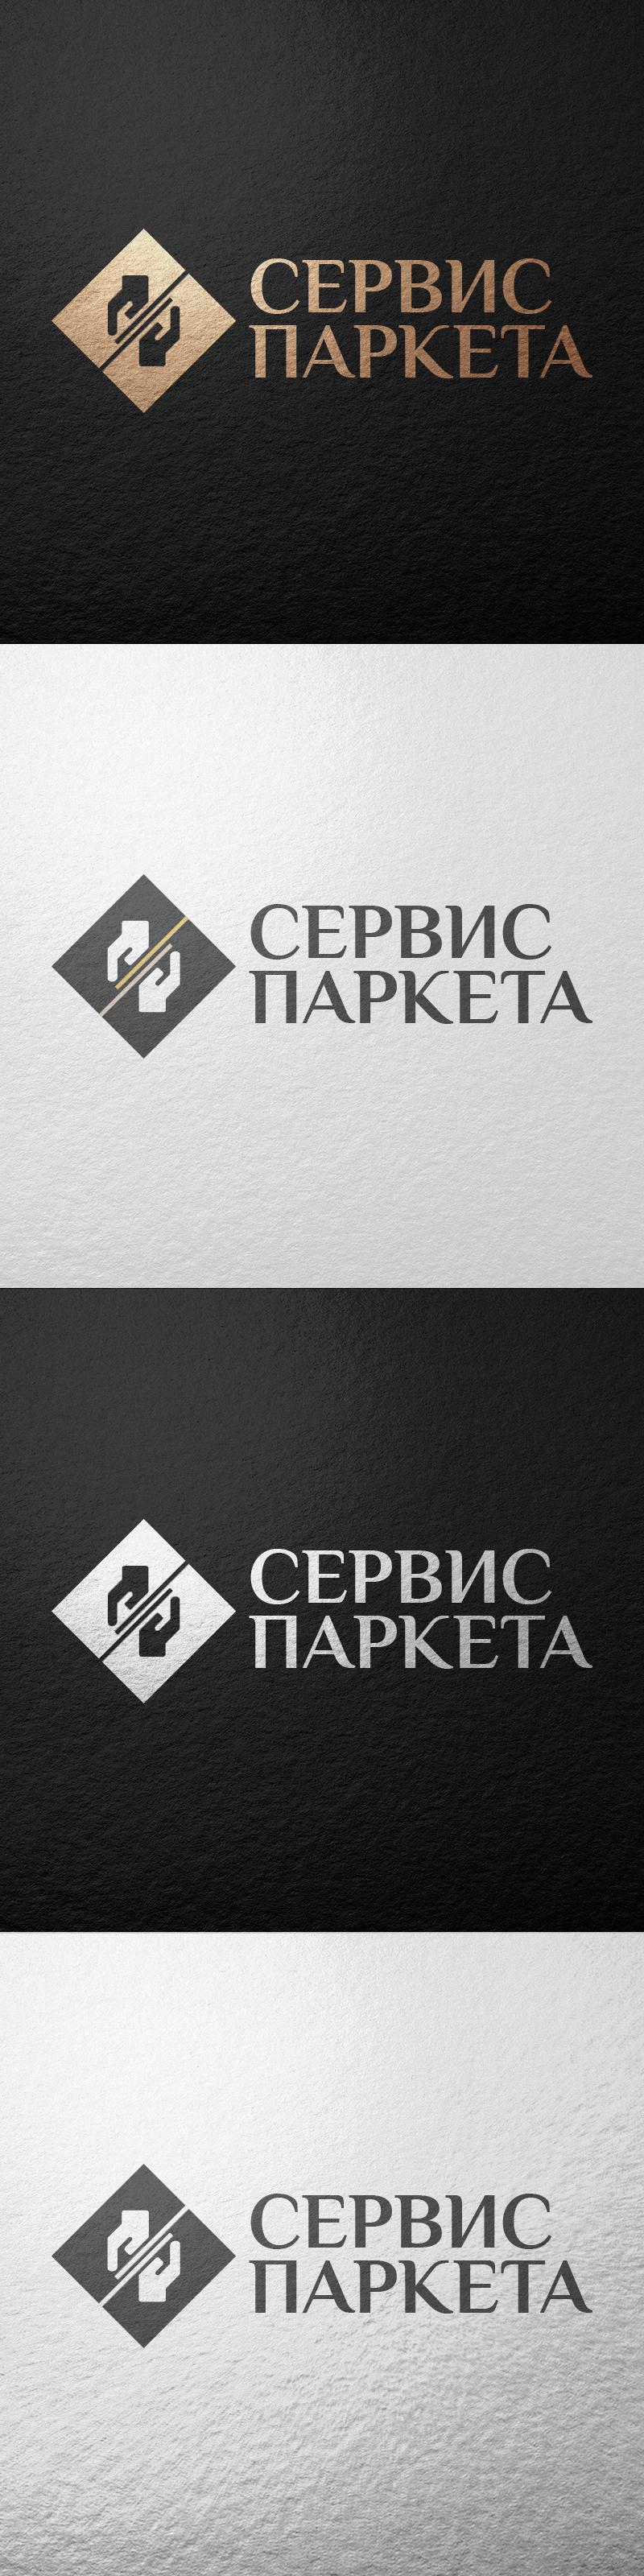 cdn.freelance.ru.jpeg